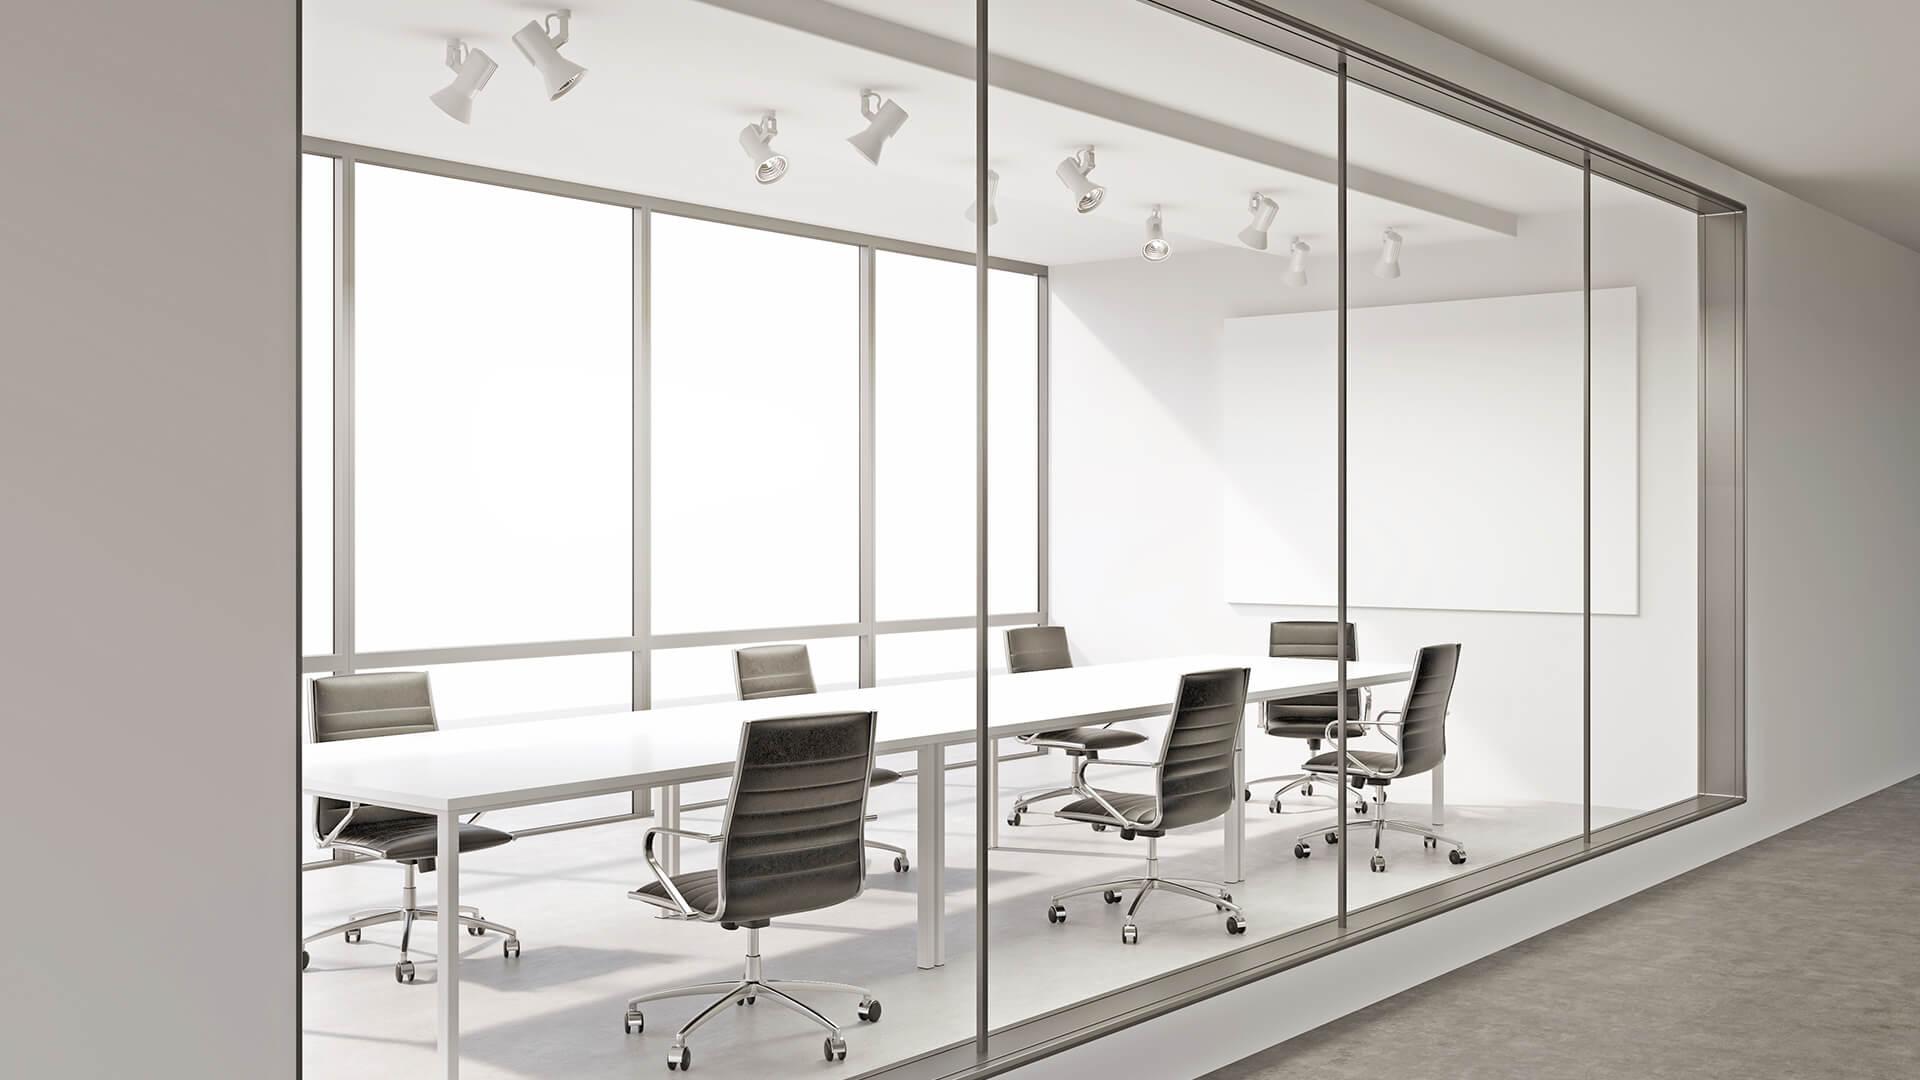 ofis camlari ve ofis cam bolme islemi - Ofis Camı Tamiri